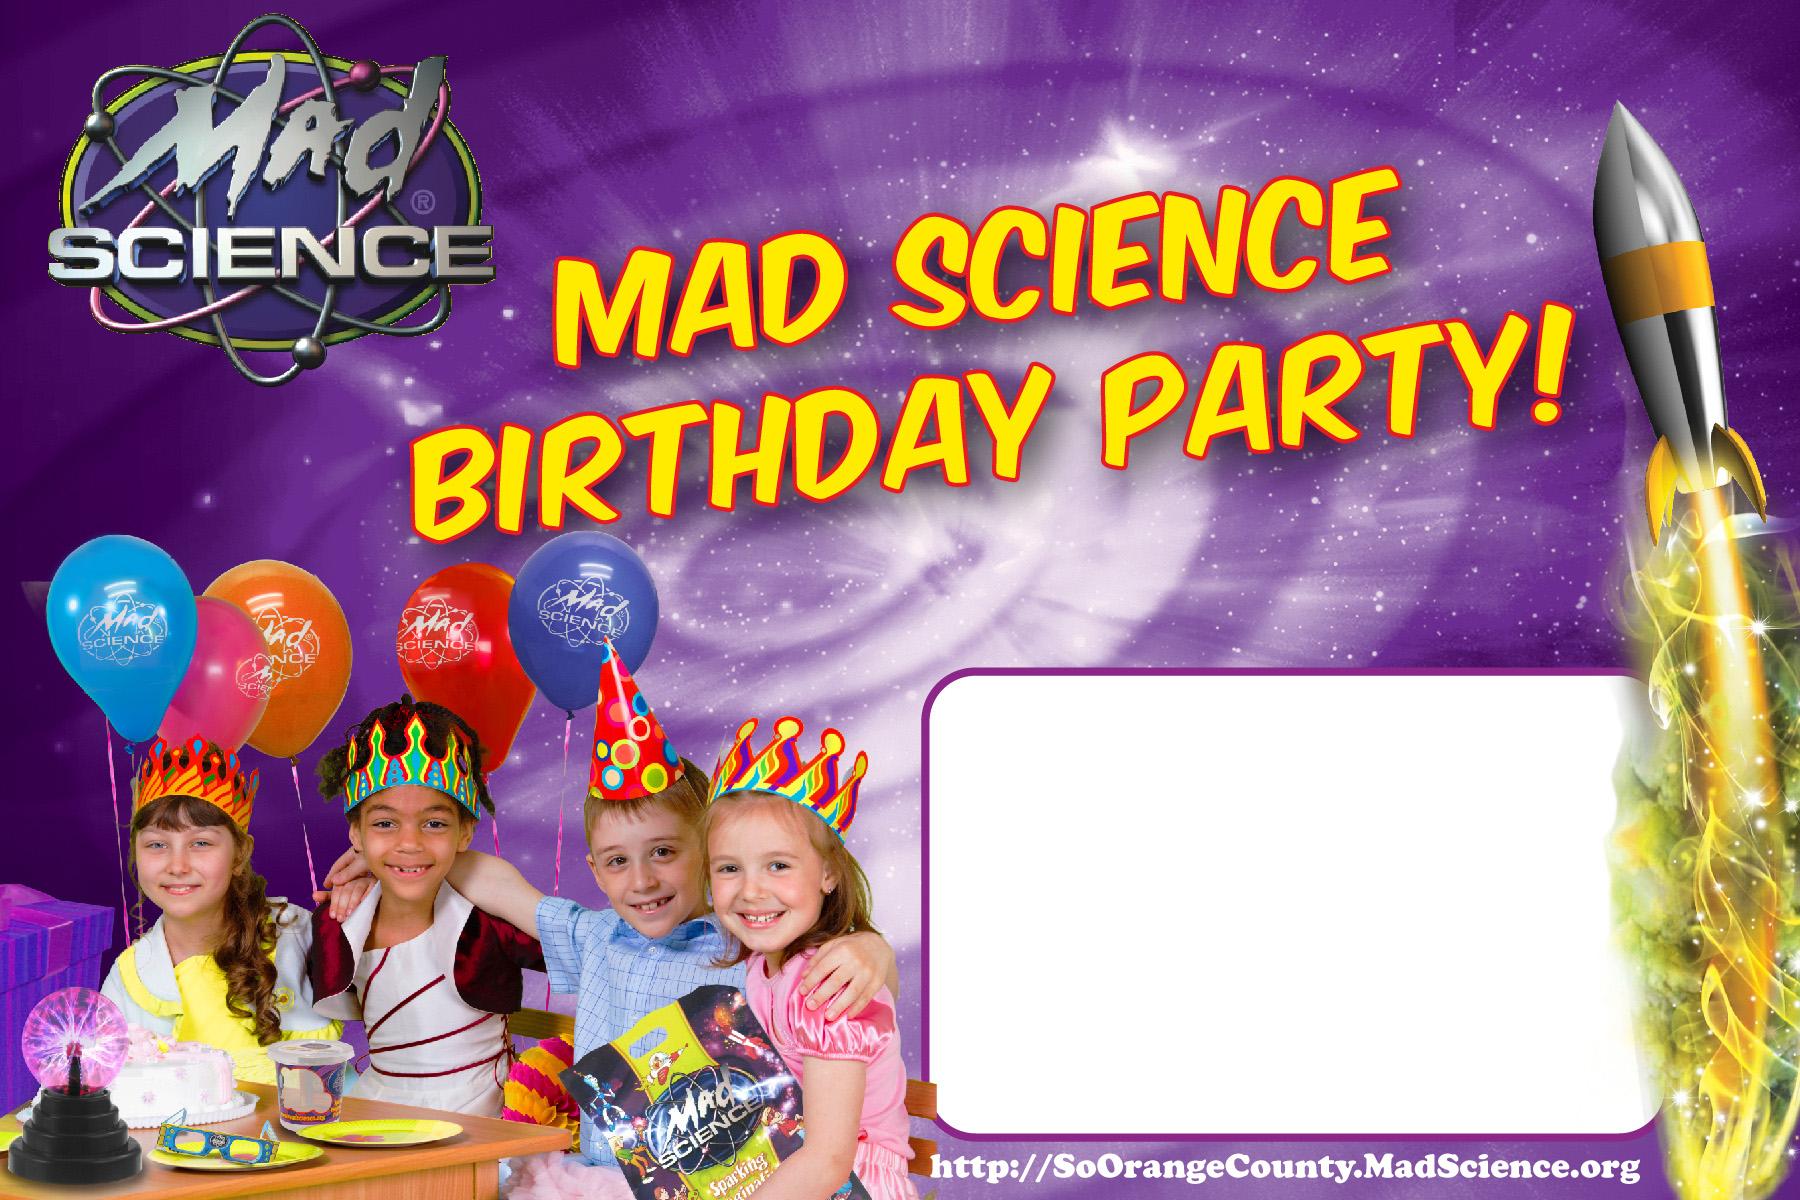 http://SoOrangeCounty.madscience.org/.aspx **